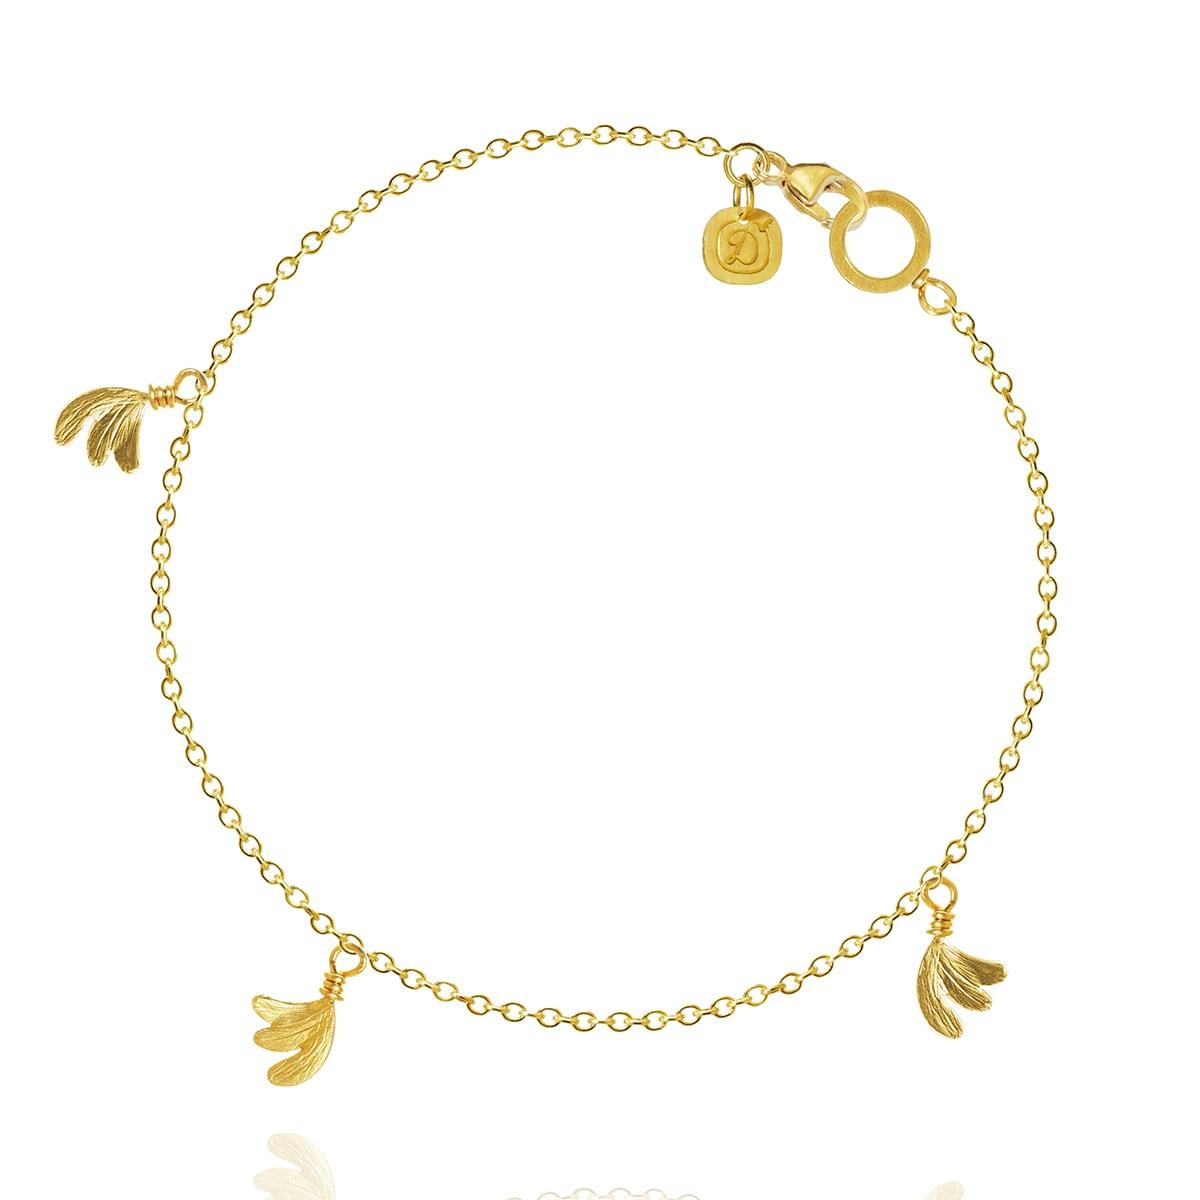 Dulong, Fine Jewelry_Aura_Guldarmband_AUR4-A1010_hos_Jarl_Sandin